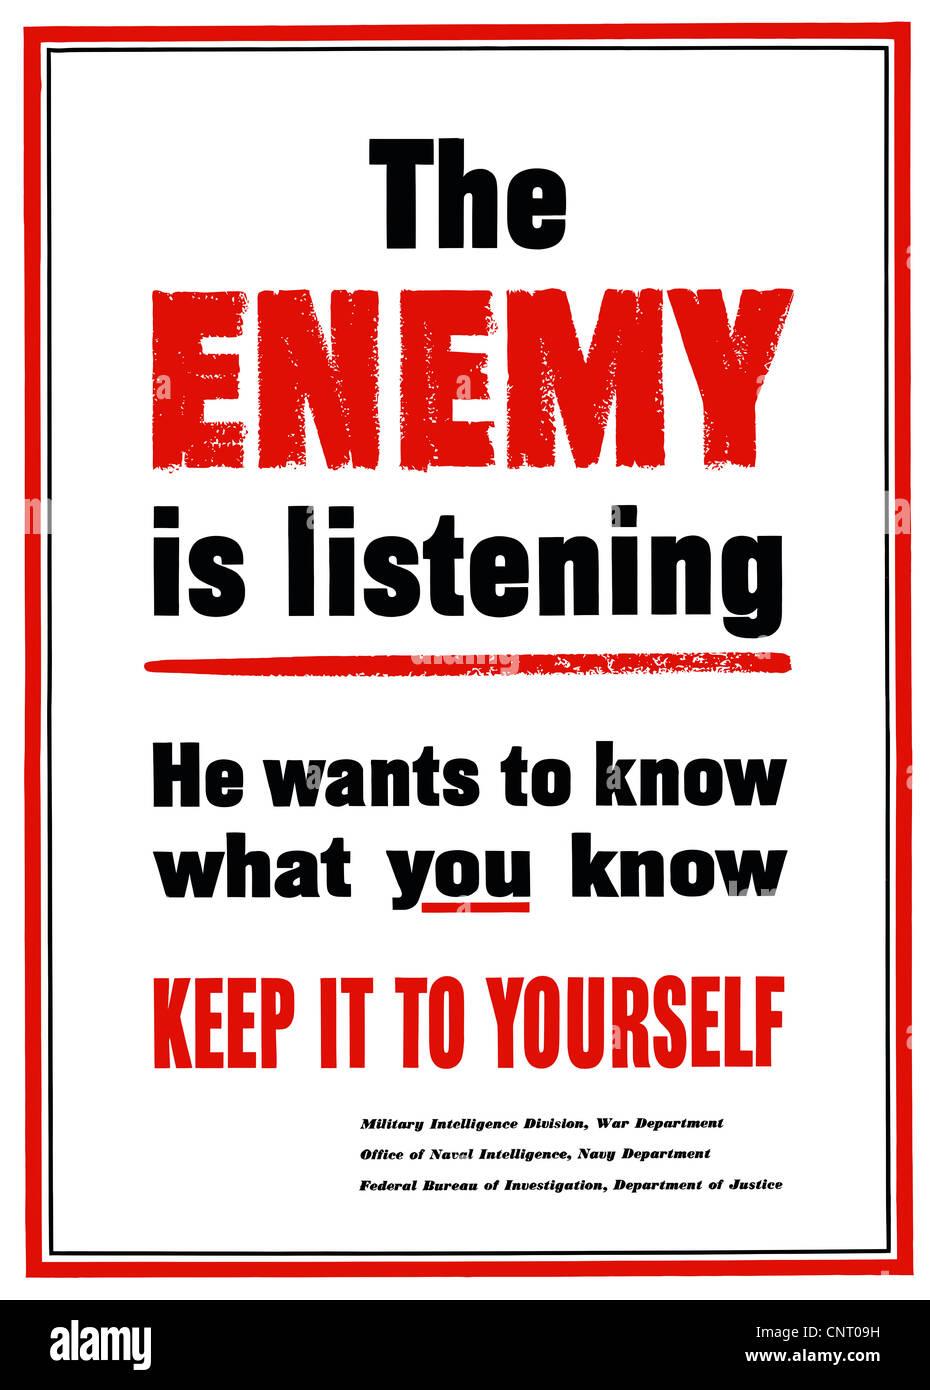 Digitally restored propaganda war poster. Stock Photo